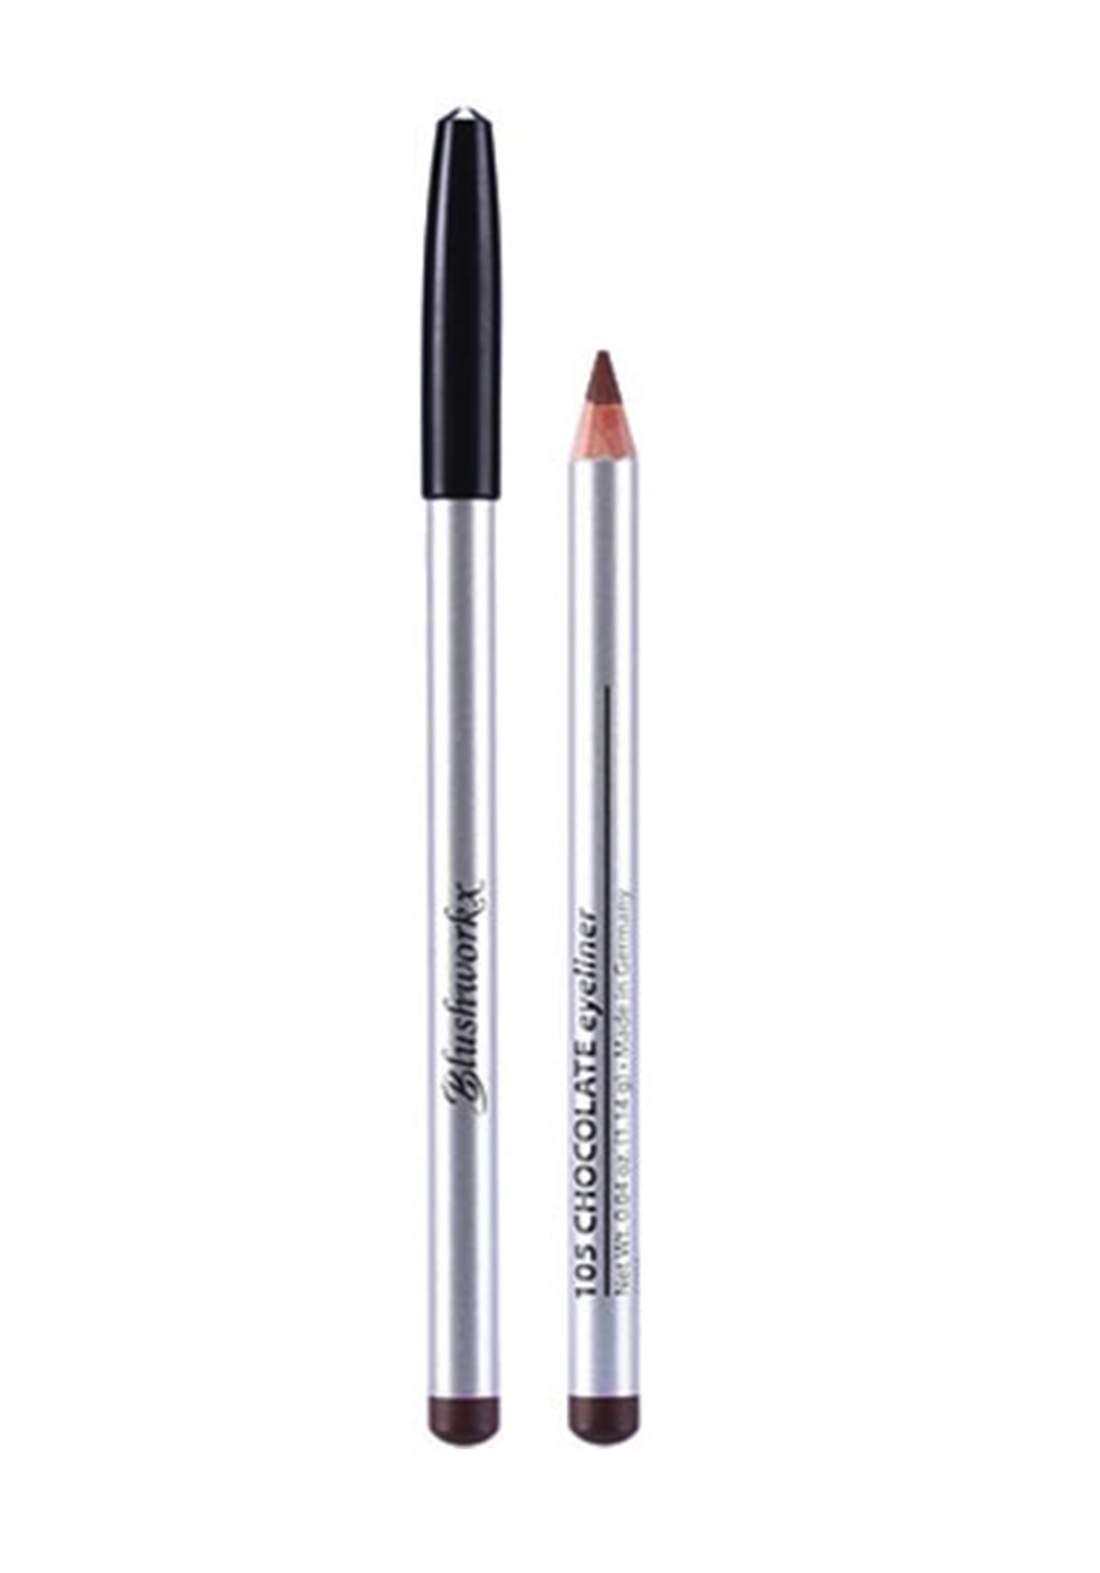 Blushworkx Hollywood Eyeliner No.105 Chocolate 1.14g محدد العيون